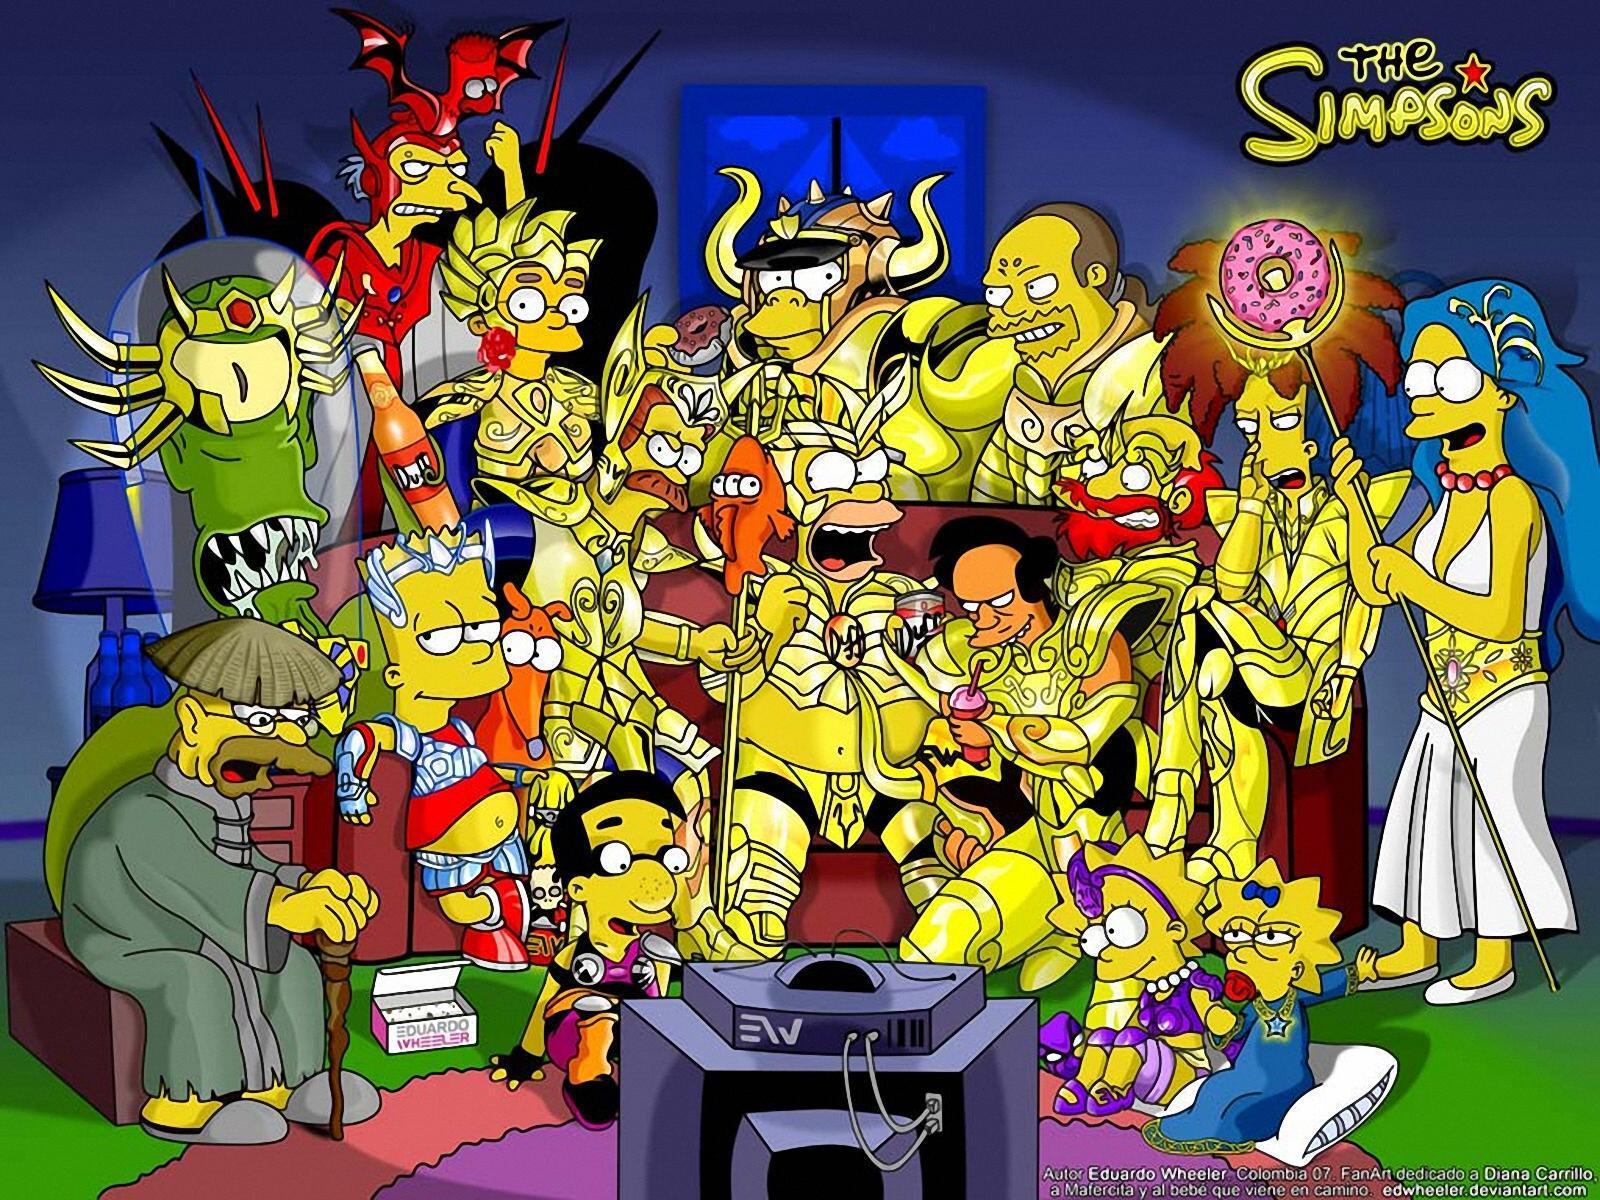 Fall Halloween Wallpaper Wallpaper Db Simpsons Wallpaper